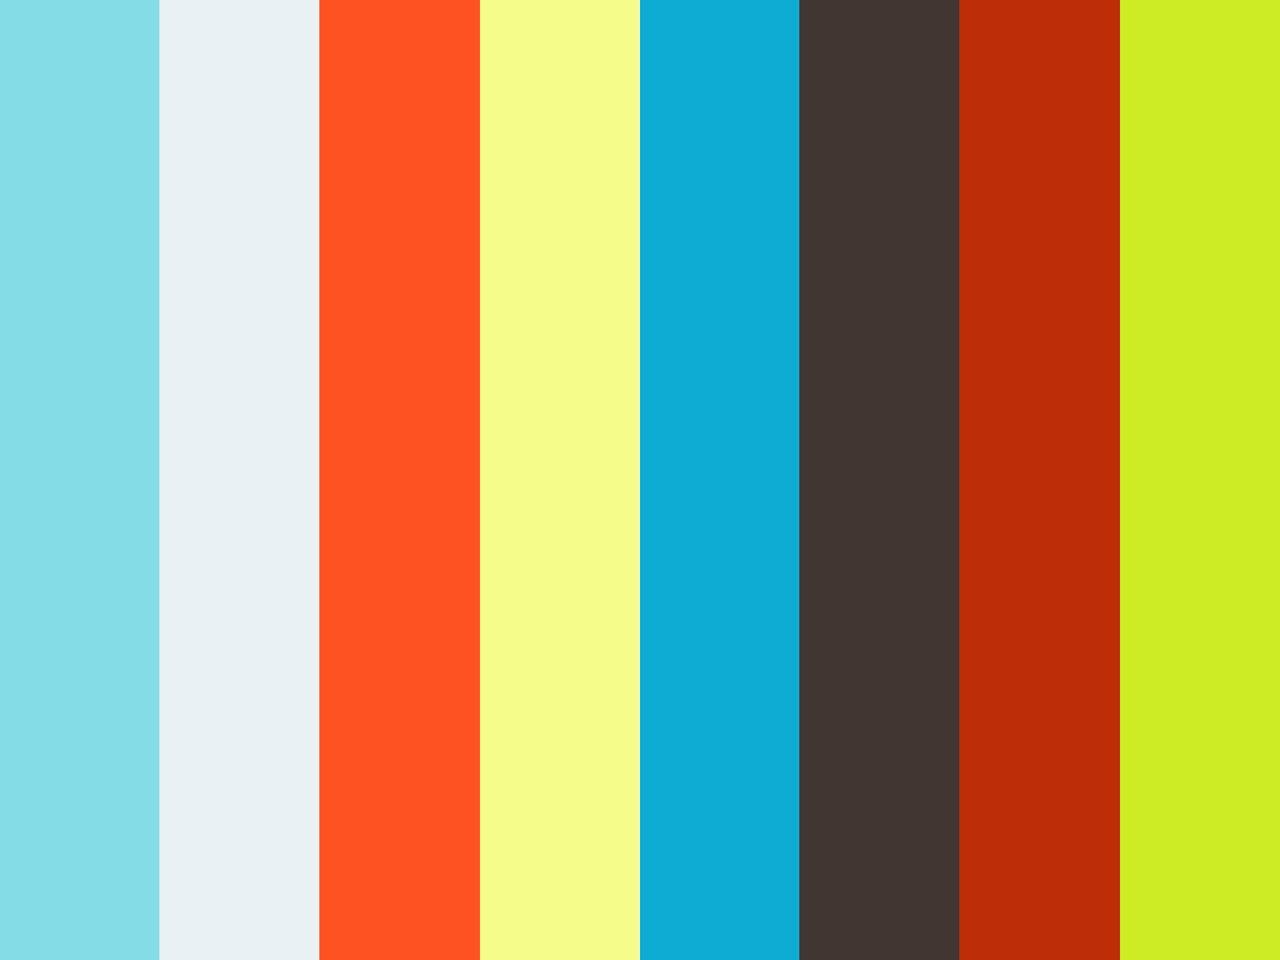 2009-stig-mister-storlaks 720p